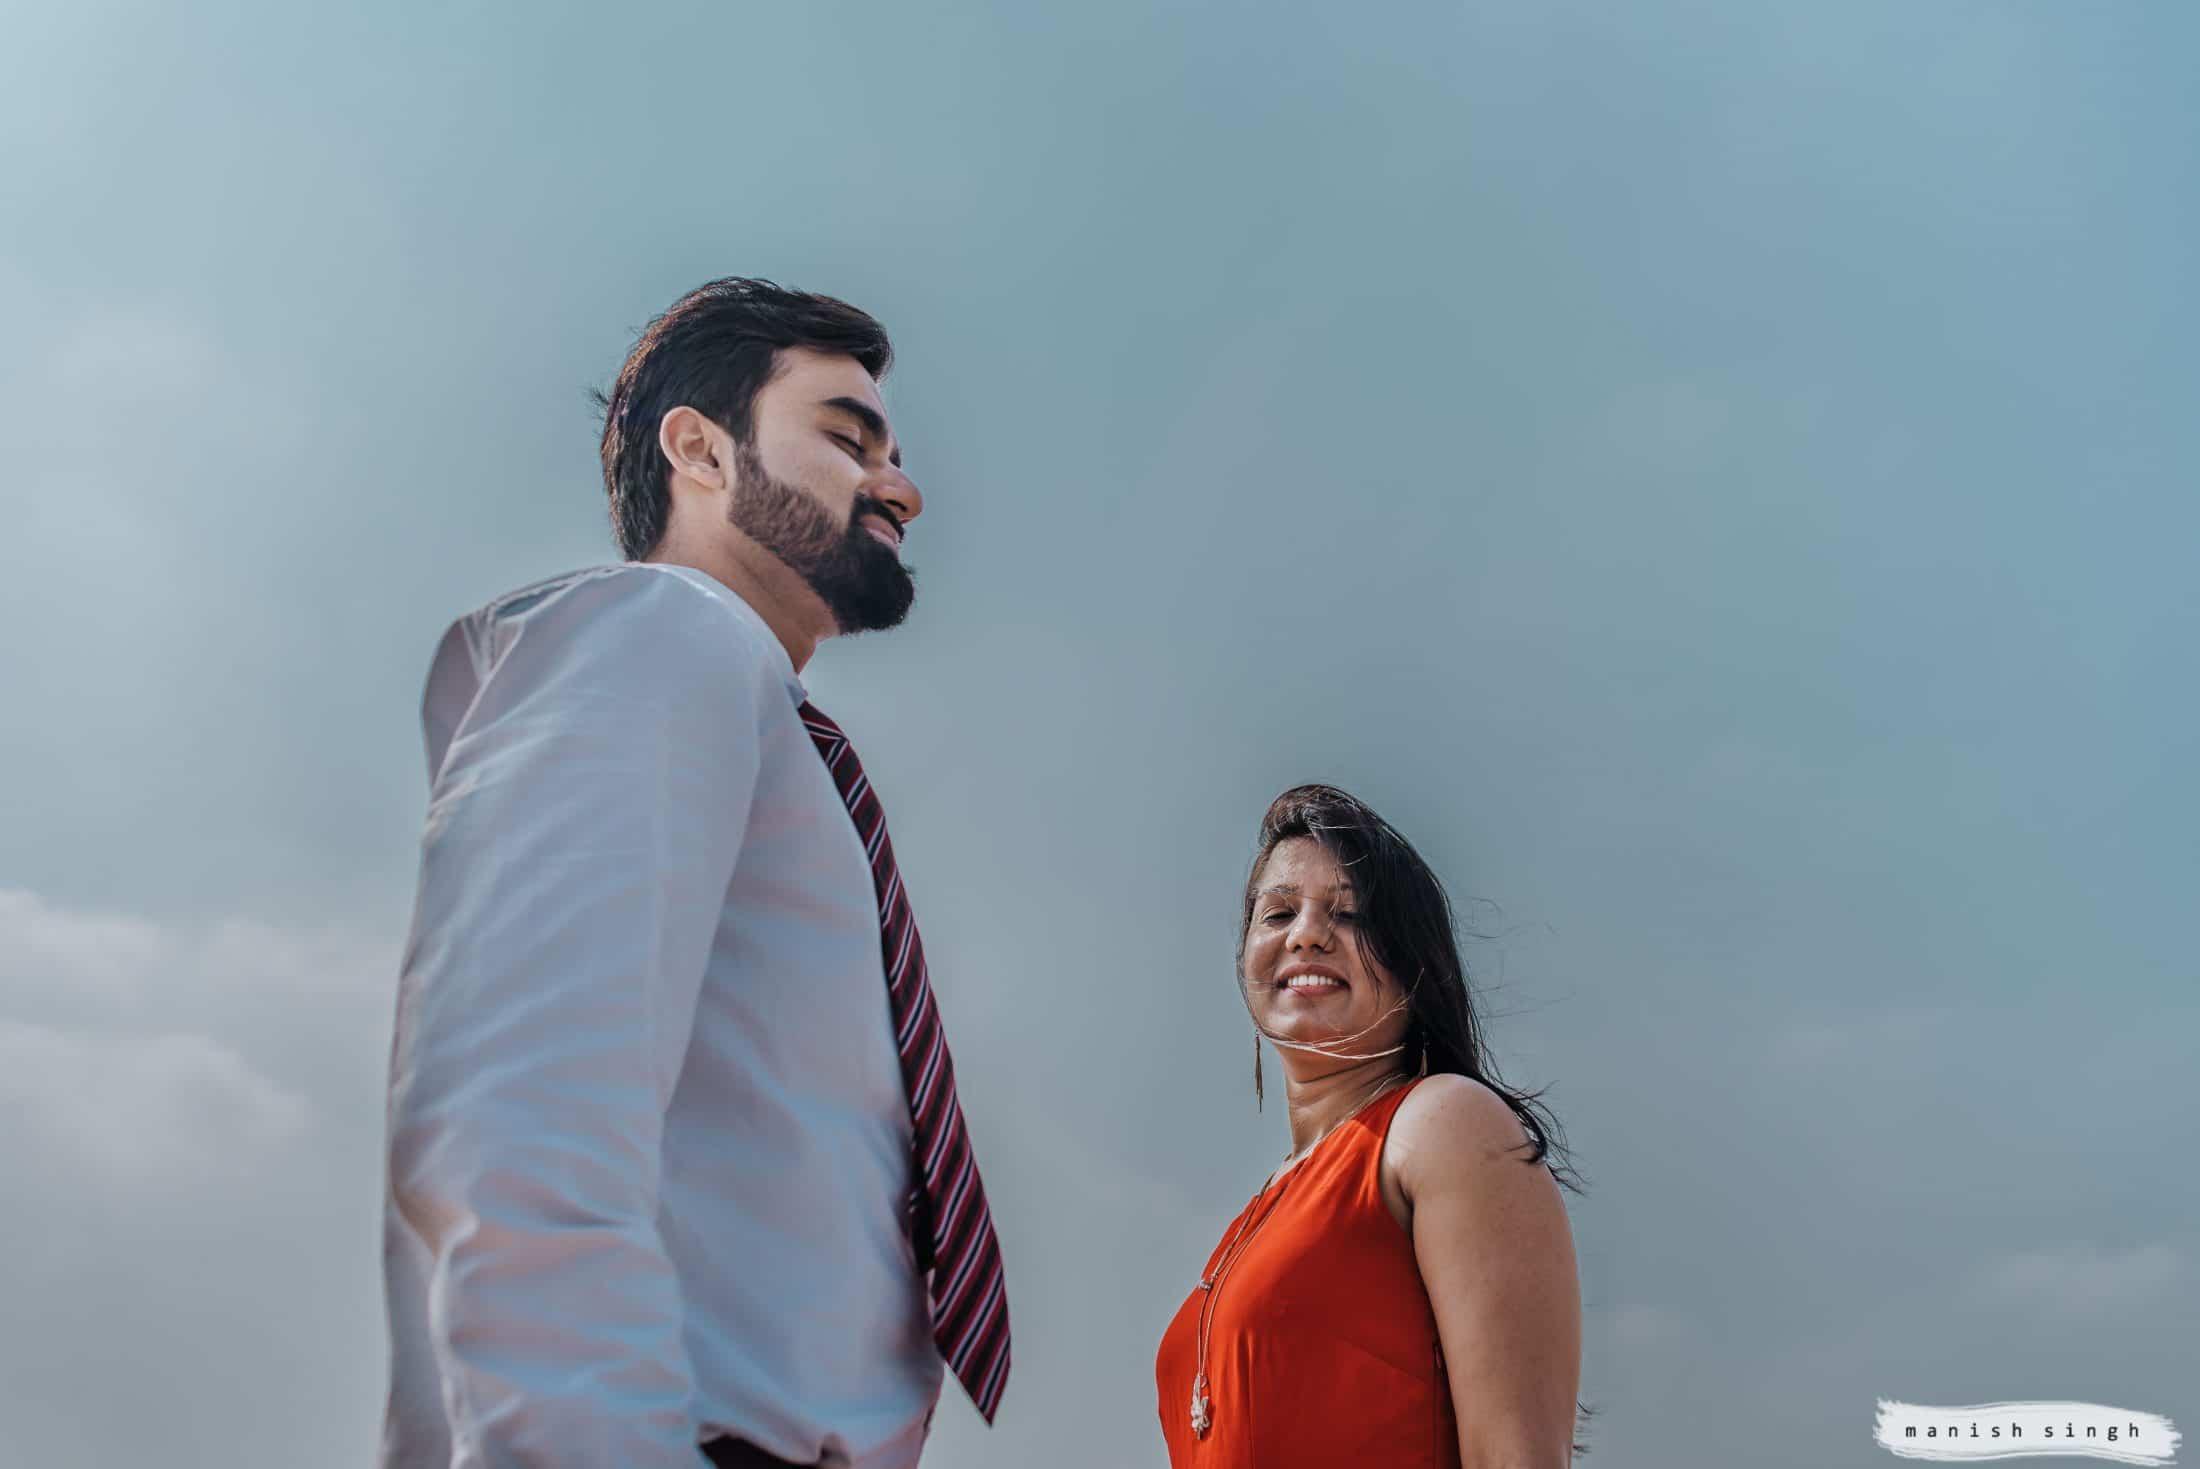 Pre-wedding photoshoot Banglore